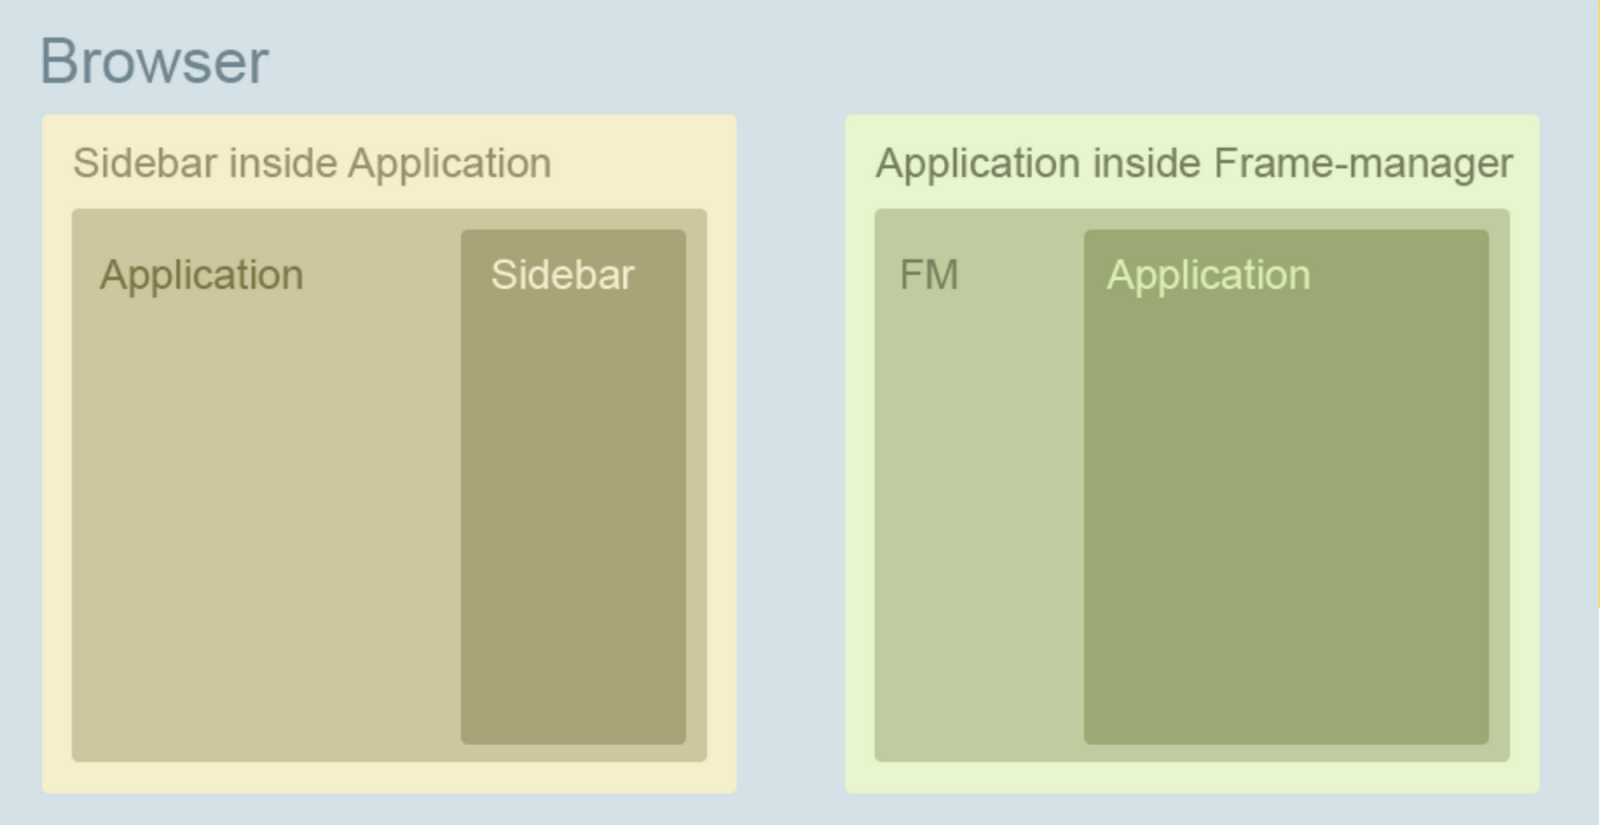 Слева концепция сайдбара (было), справа Frame Manager'а (стало)